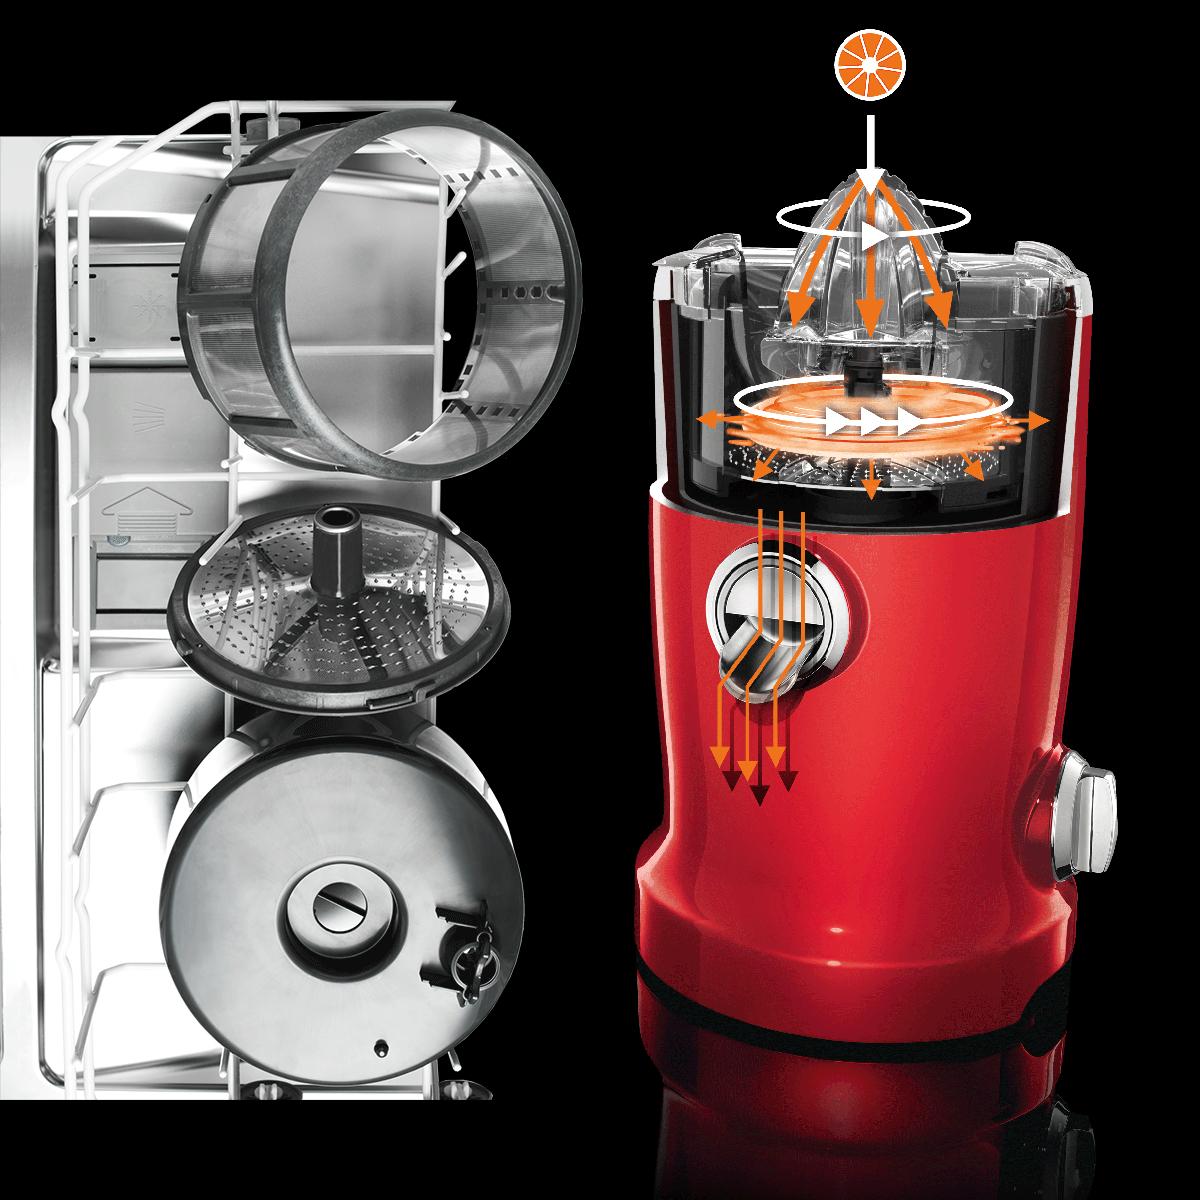 Novis Vita Juicer Silver Contour 4-in-1 Multi-Function Electric Juicer